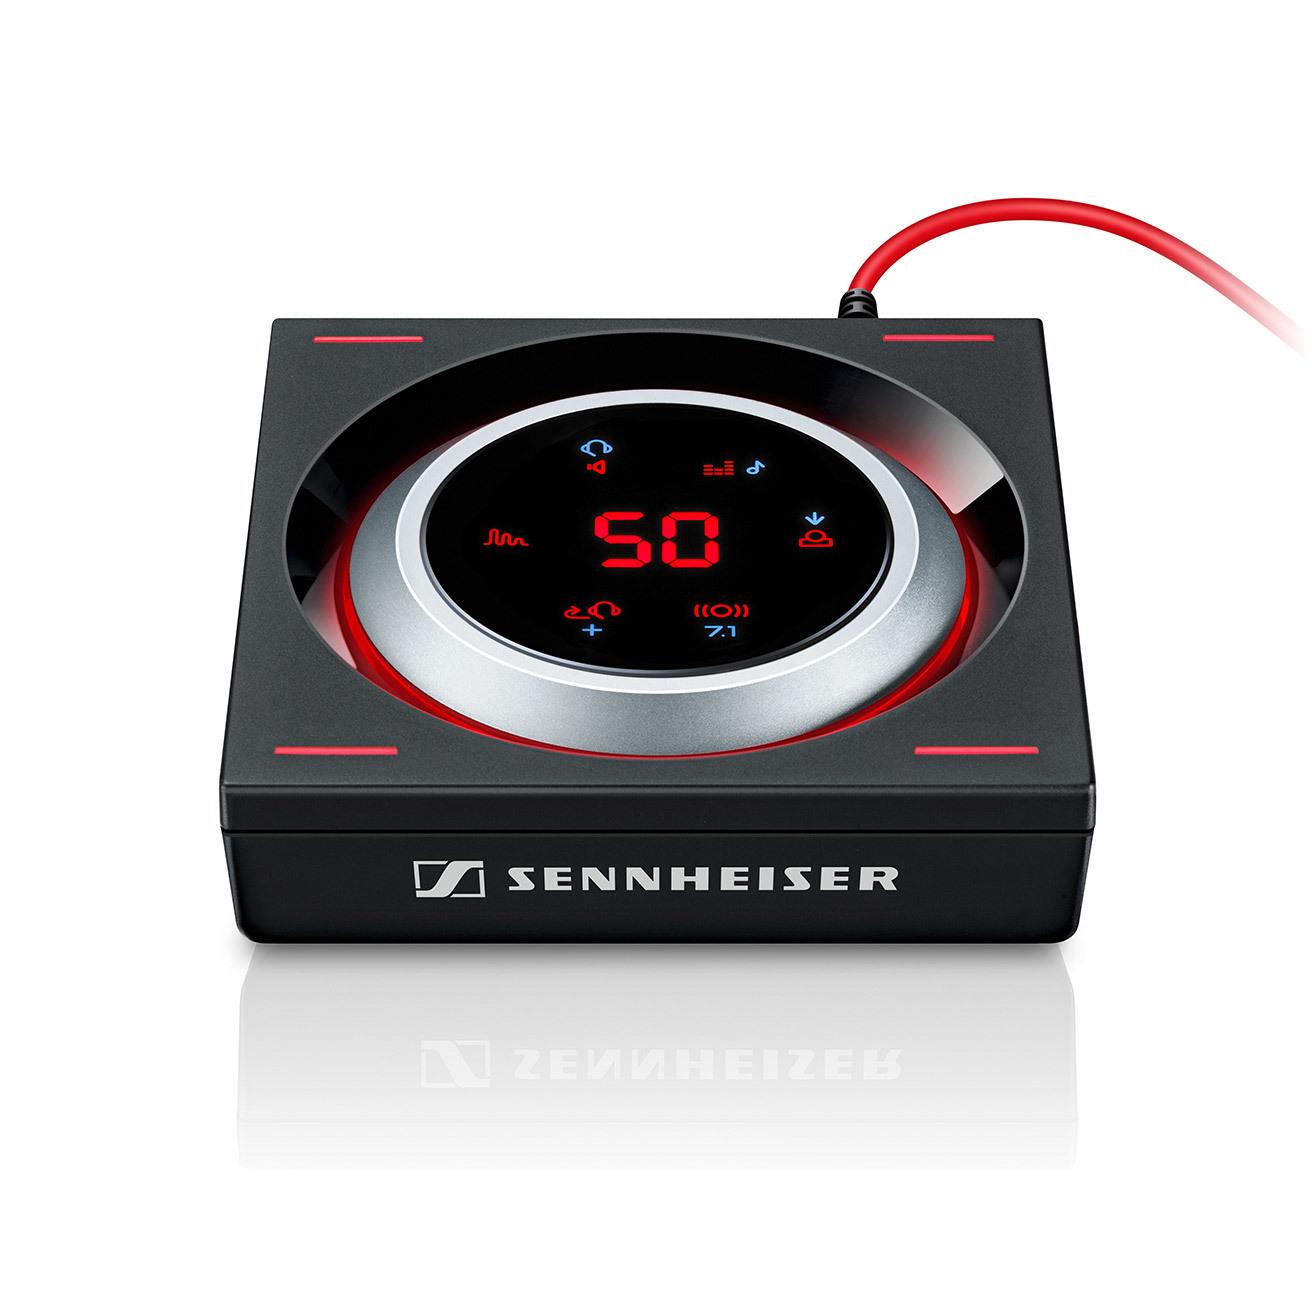 Amplificatori Sennheiser GSX, chi li conosce ? Product_detail_x2_desktop_GSX-1000_01_1312x1312_2